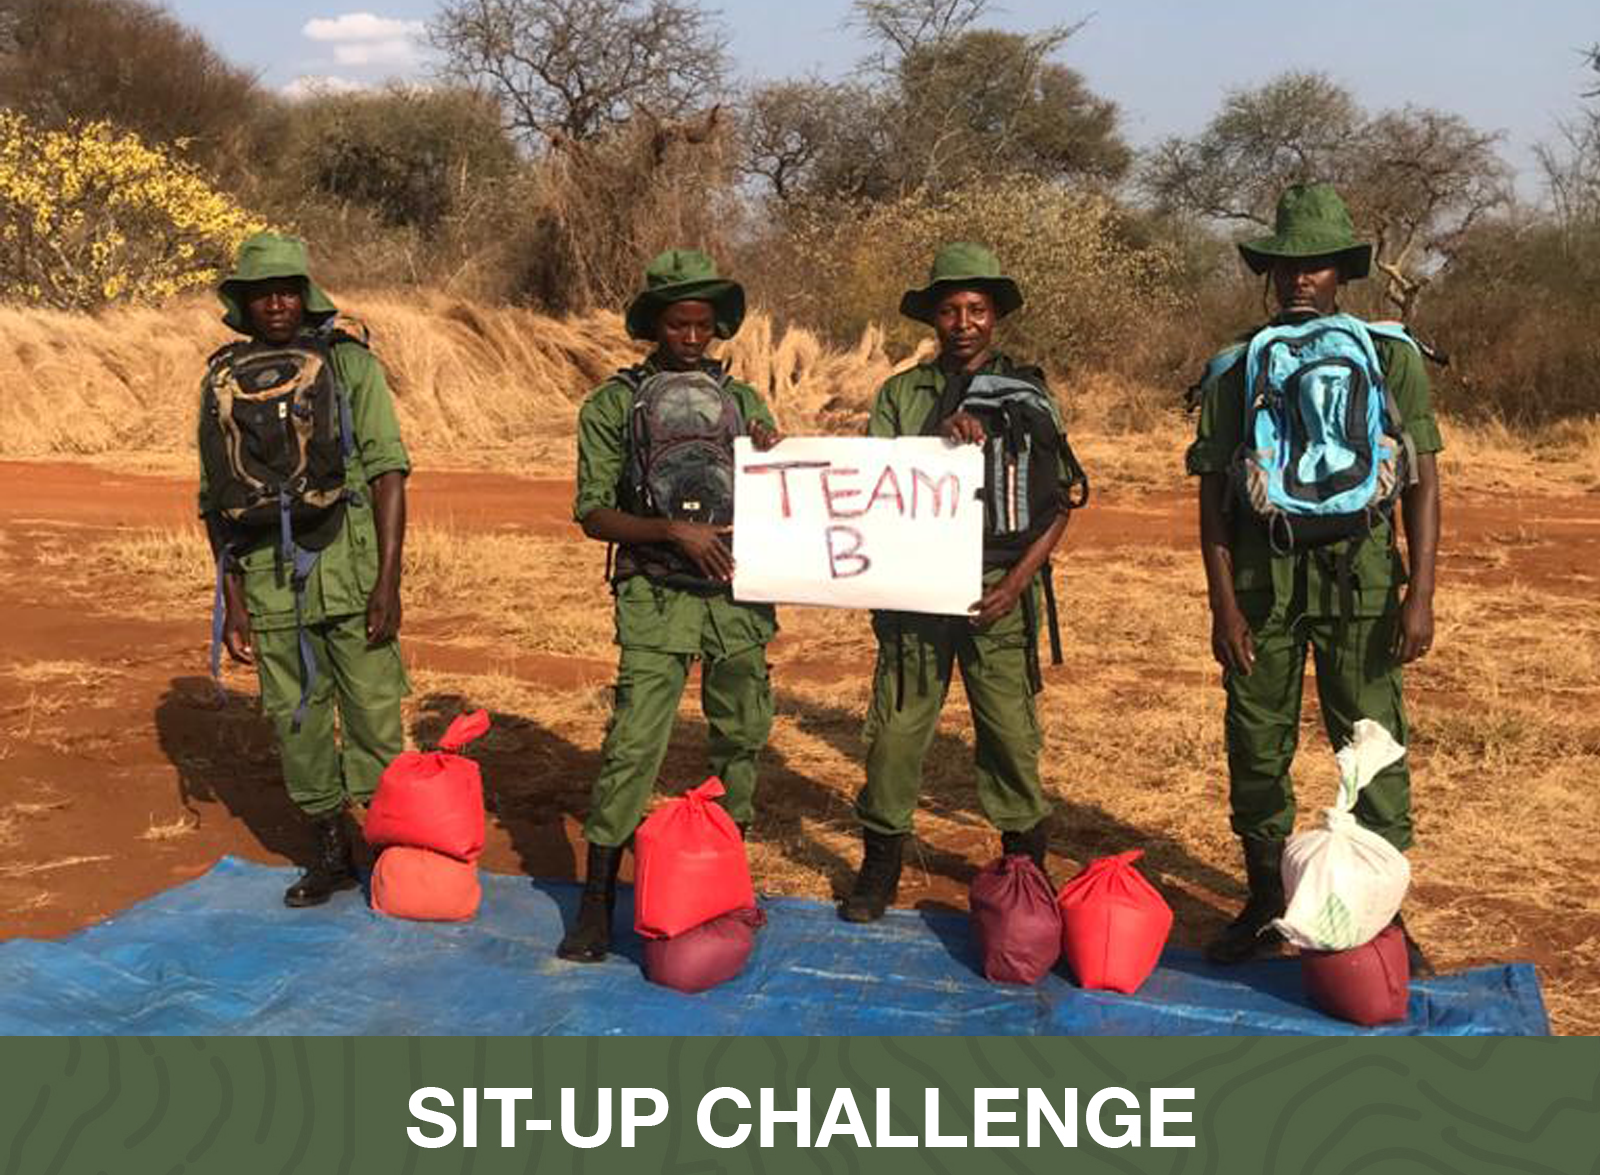 Sit-Up Challenge Winners - African People & Wildlife - Tarangire Ecosystem Team B Tanzania